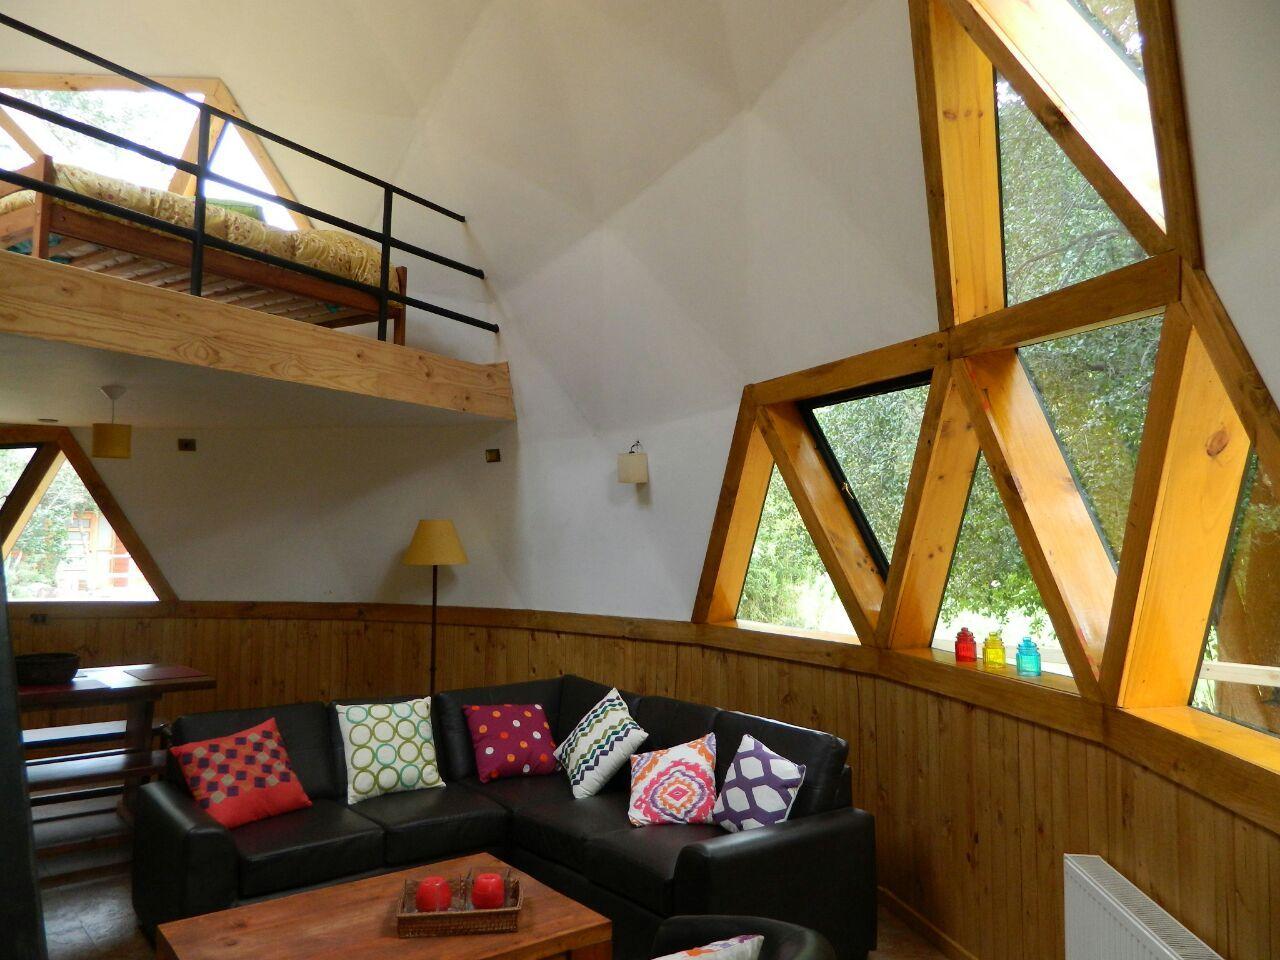 Resultado de imagen para domo 3 8 5 8 casa domo - Casas geodesicas ...